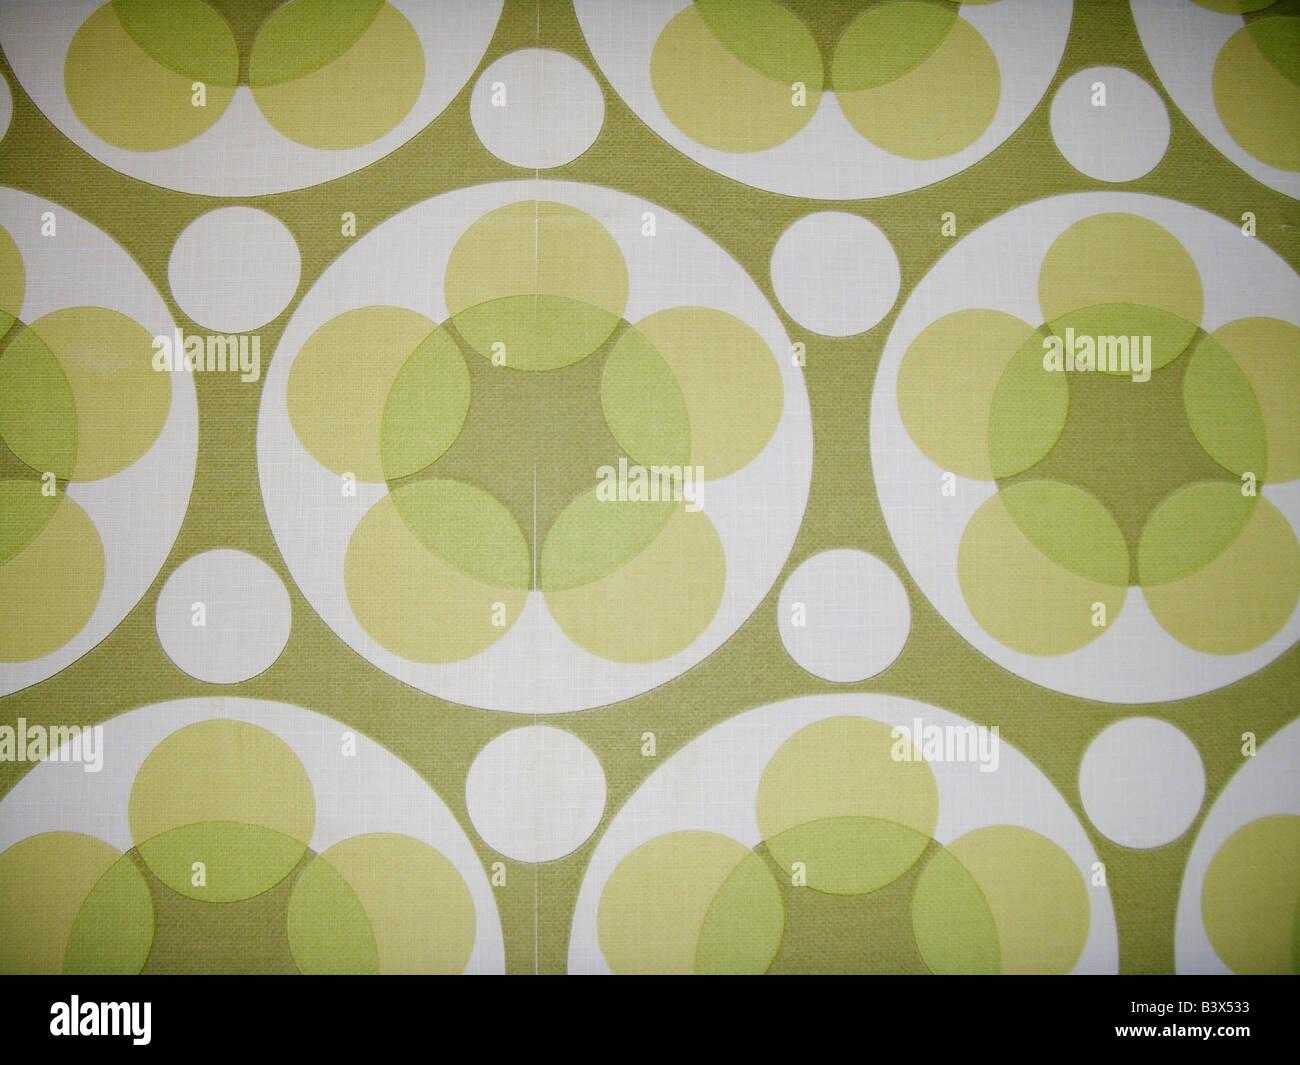 tapeten retro design elegant in tapeten im retro design fr dein wohnzimmer with tapeten retro. Black Bedroom Furniture Sets. Home Design Ideas